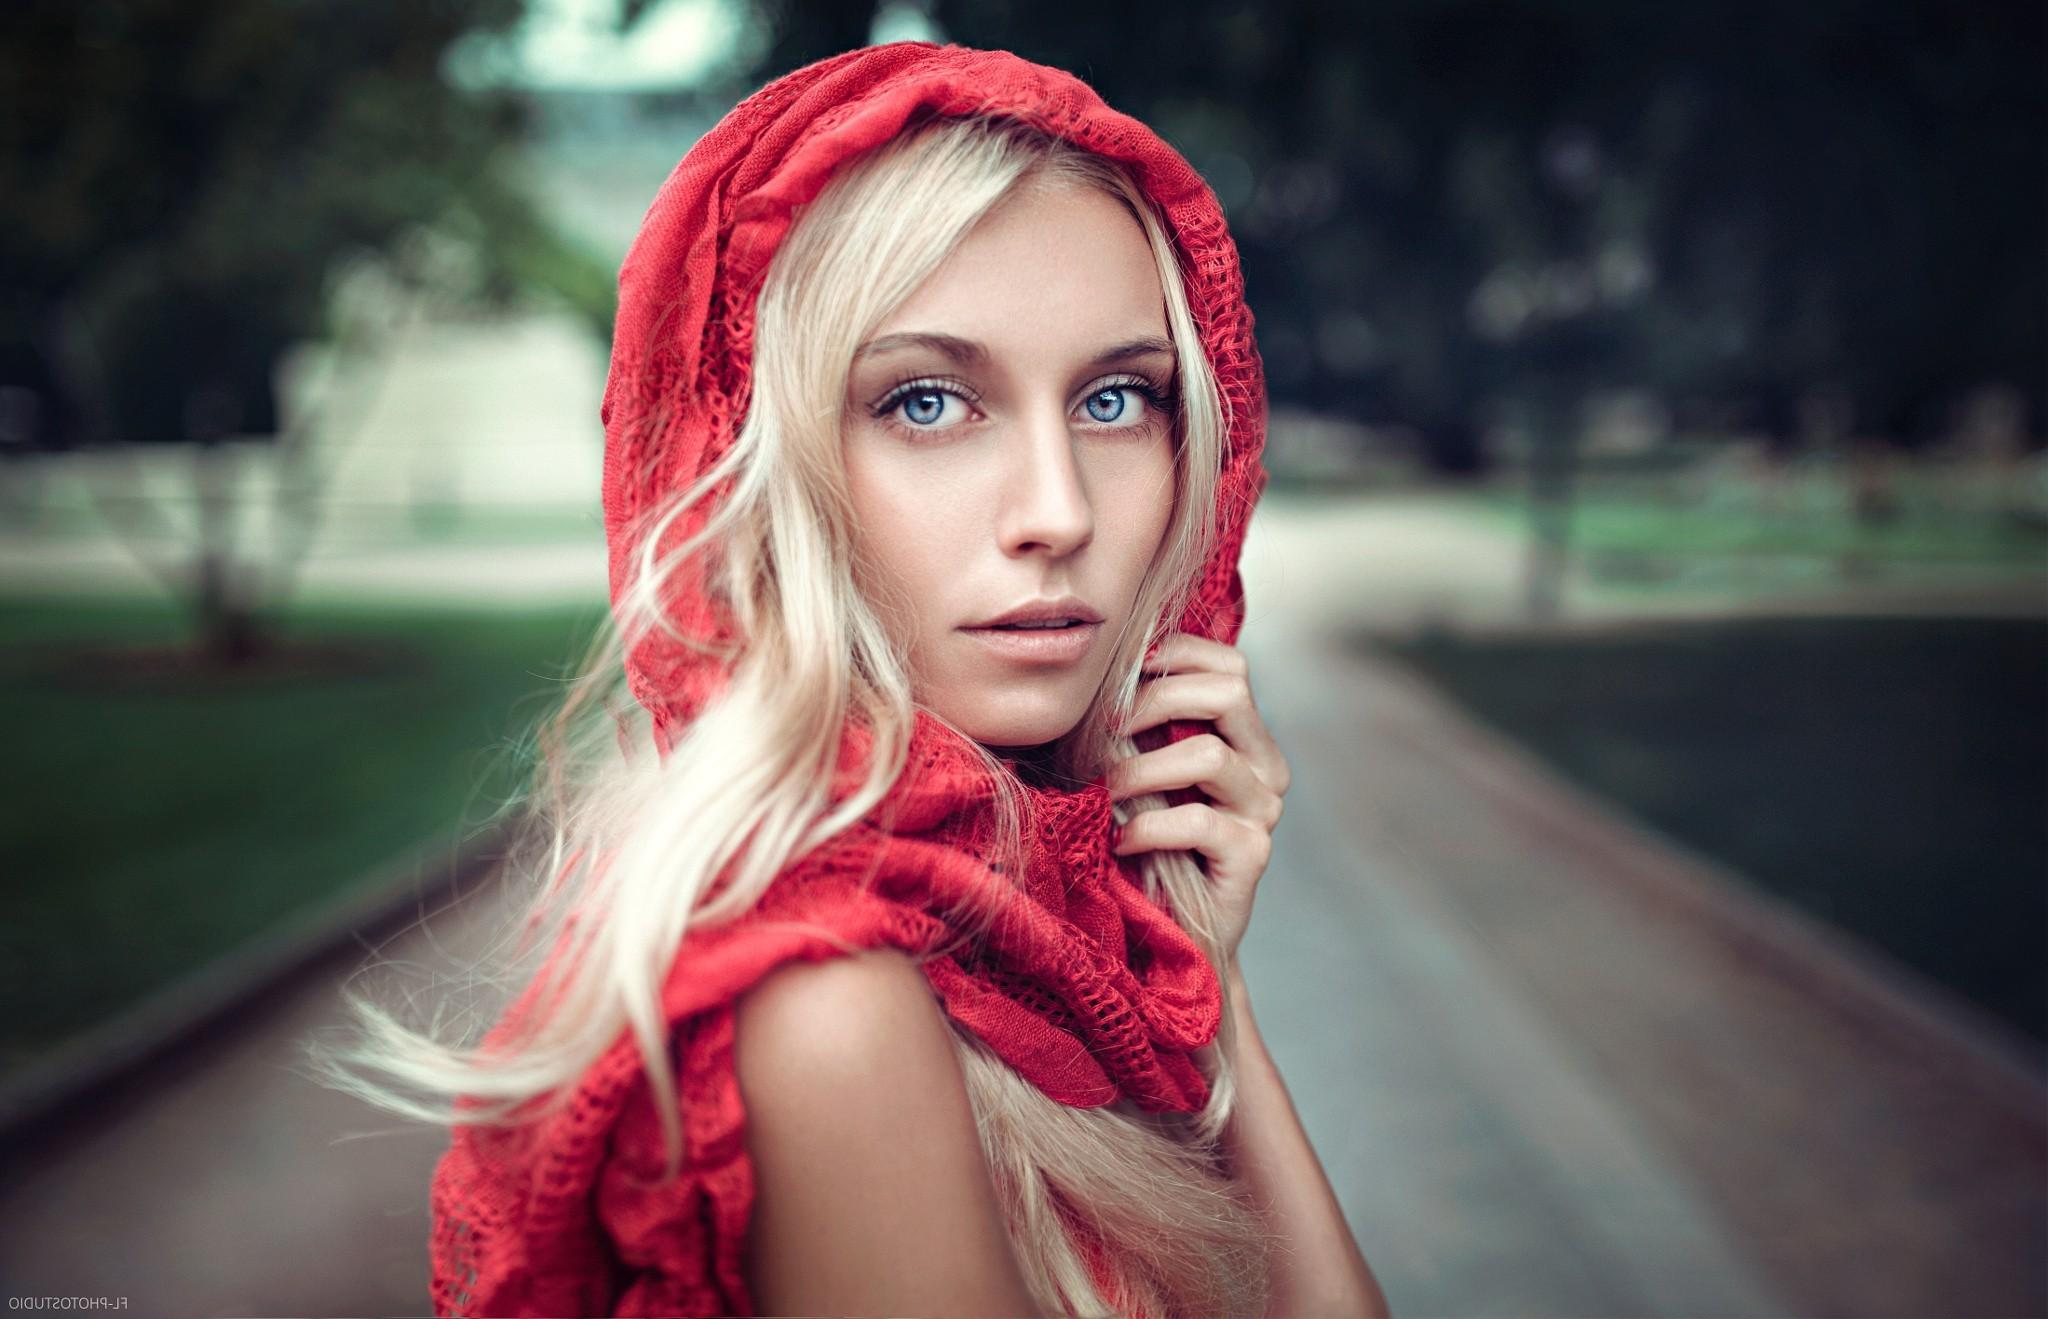 Hintergrundbilder Frau Modell Porträt Lange Haare Rot